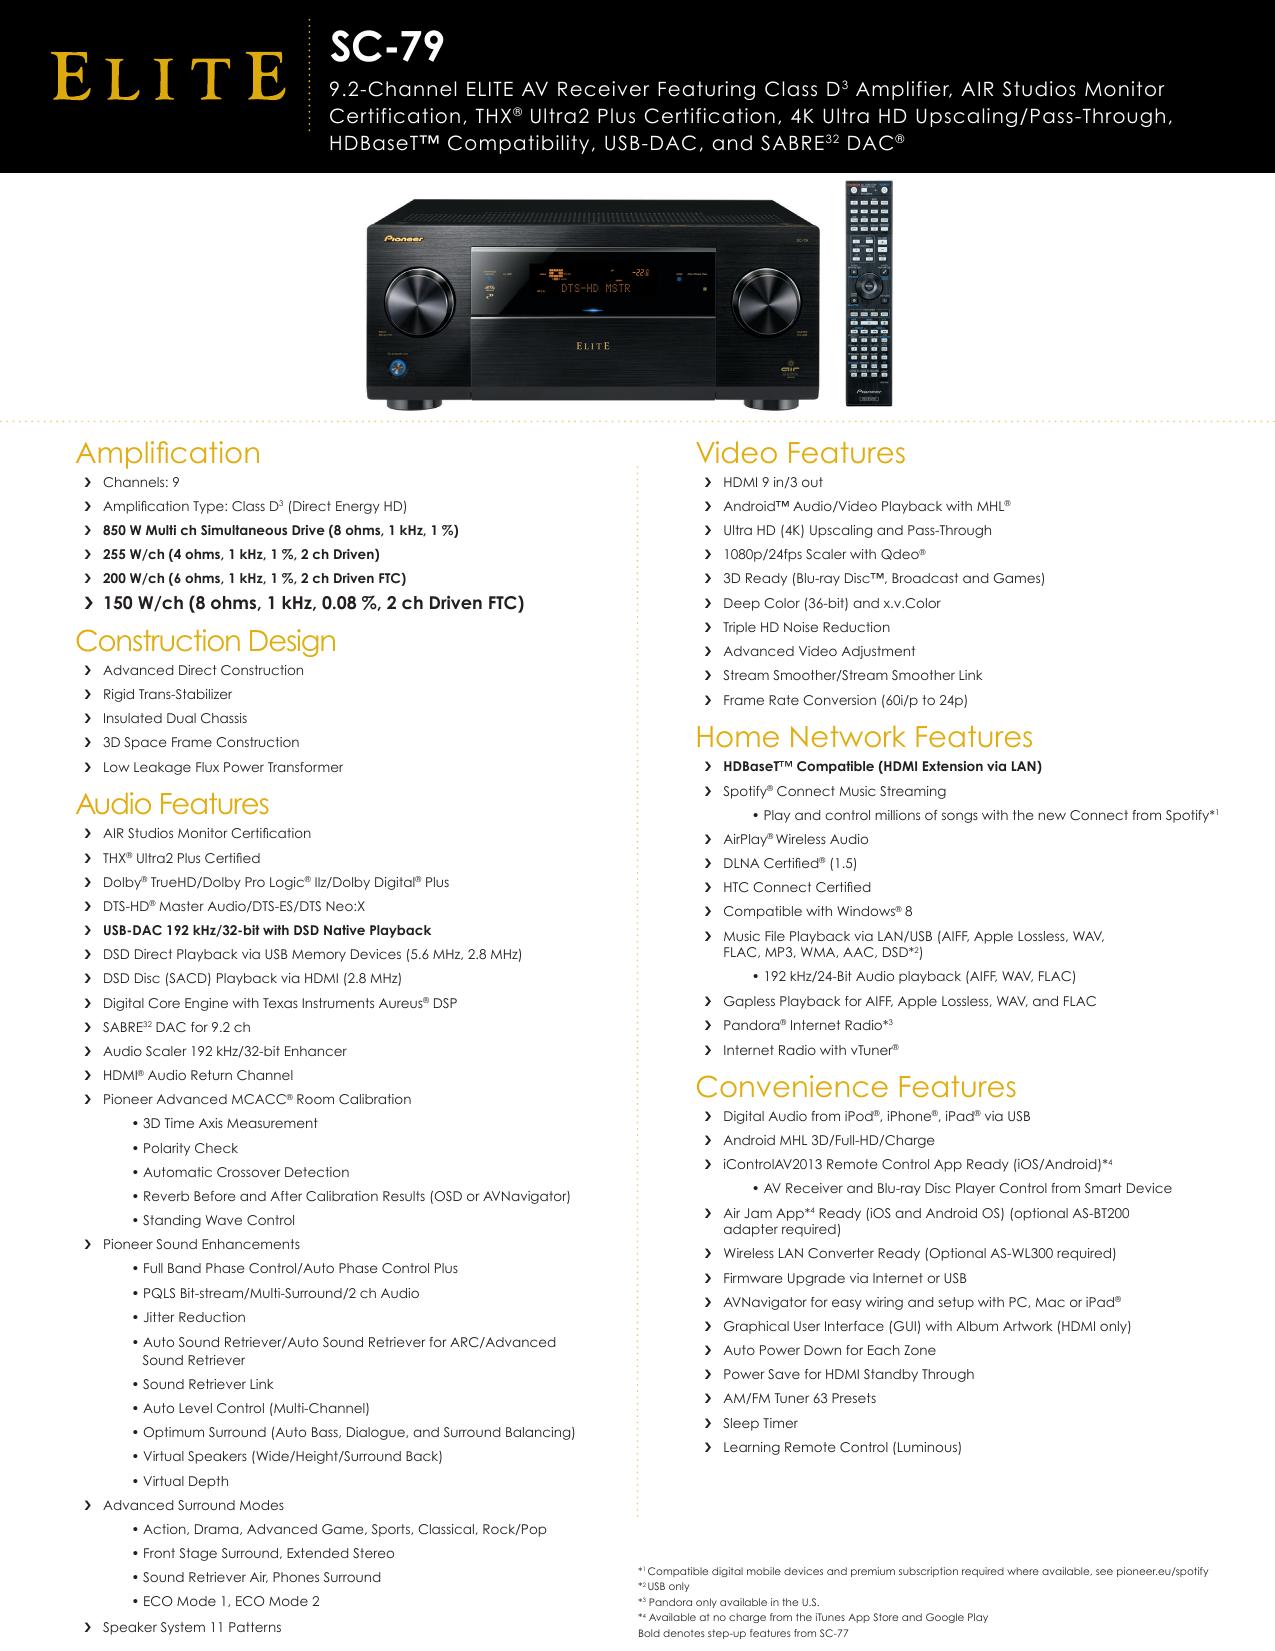 Amplification Construction Design Audio | manualzz com